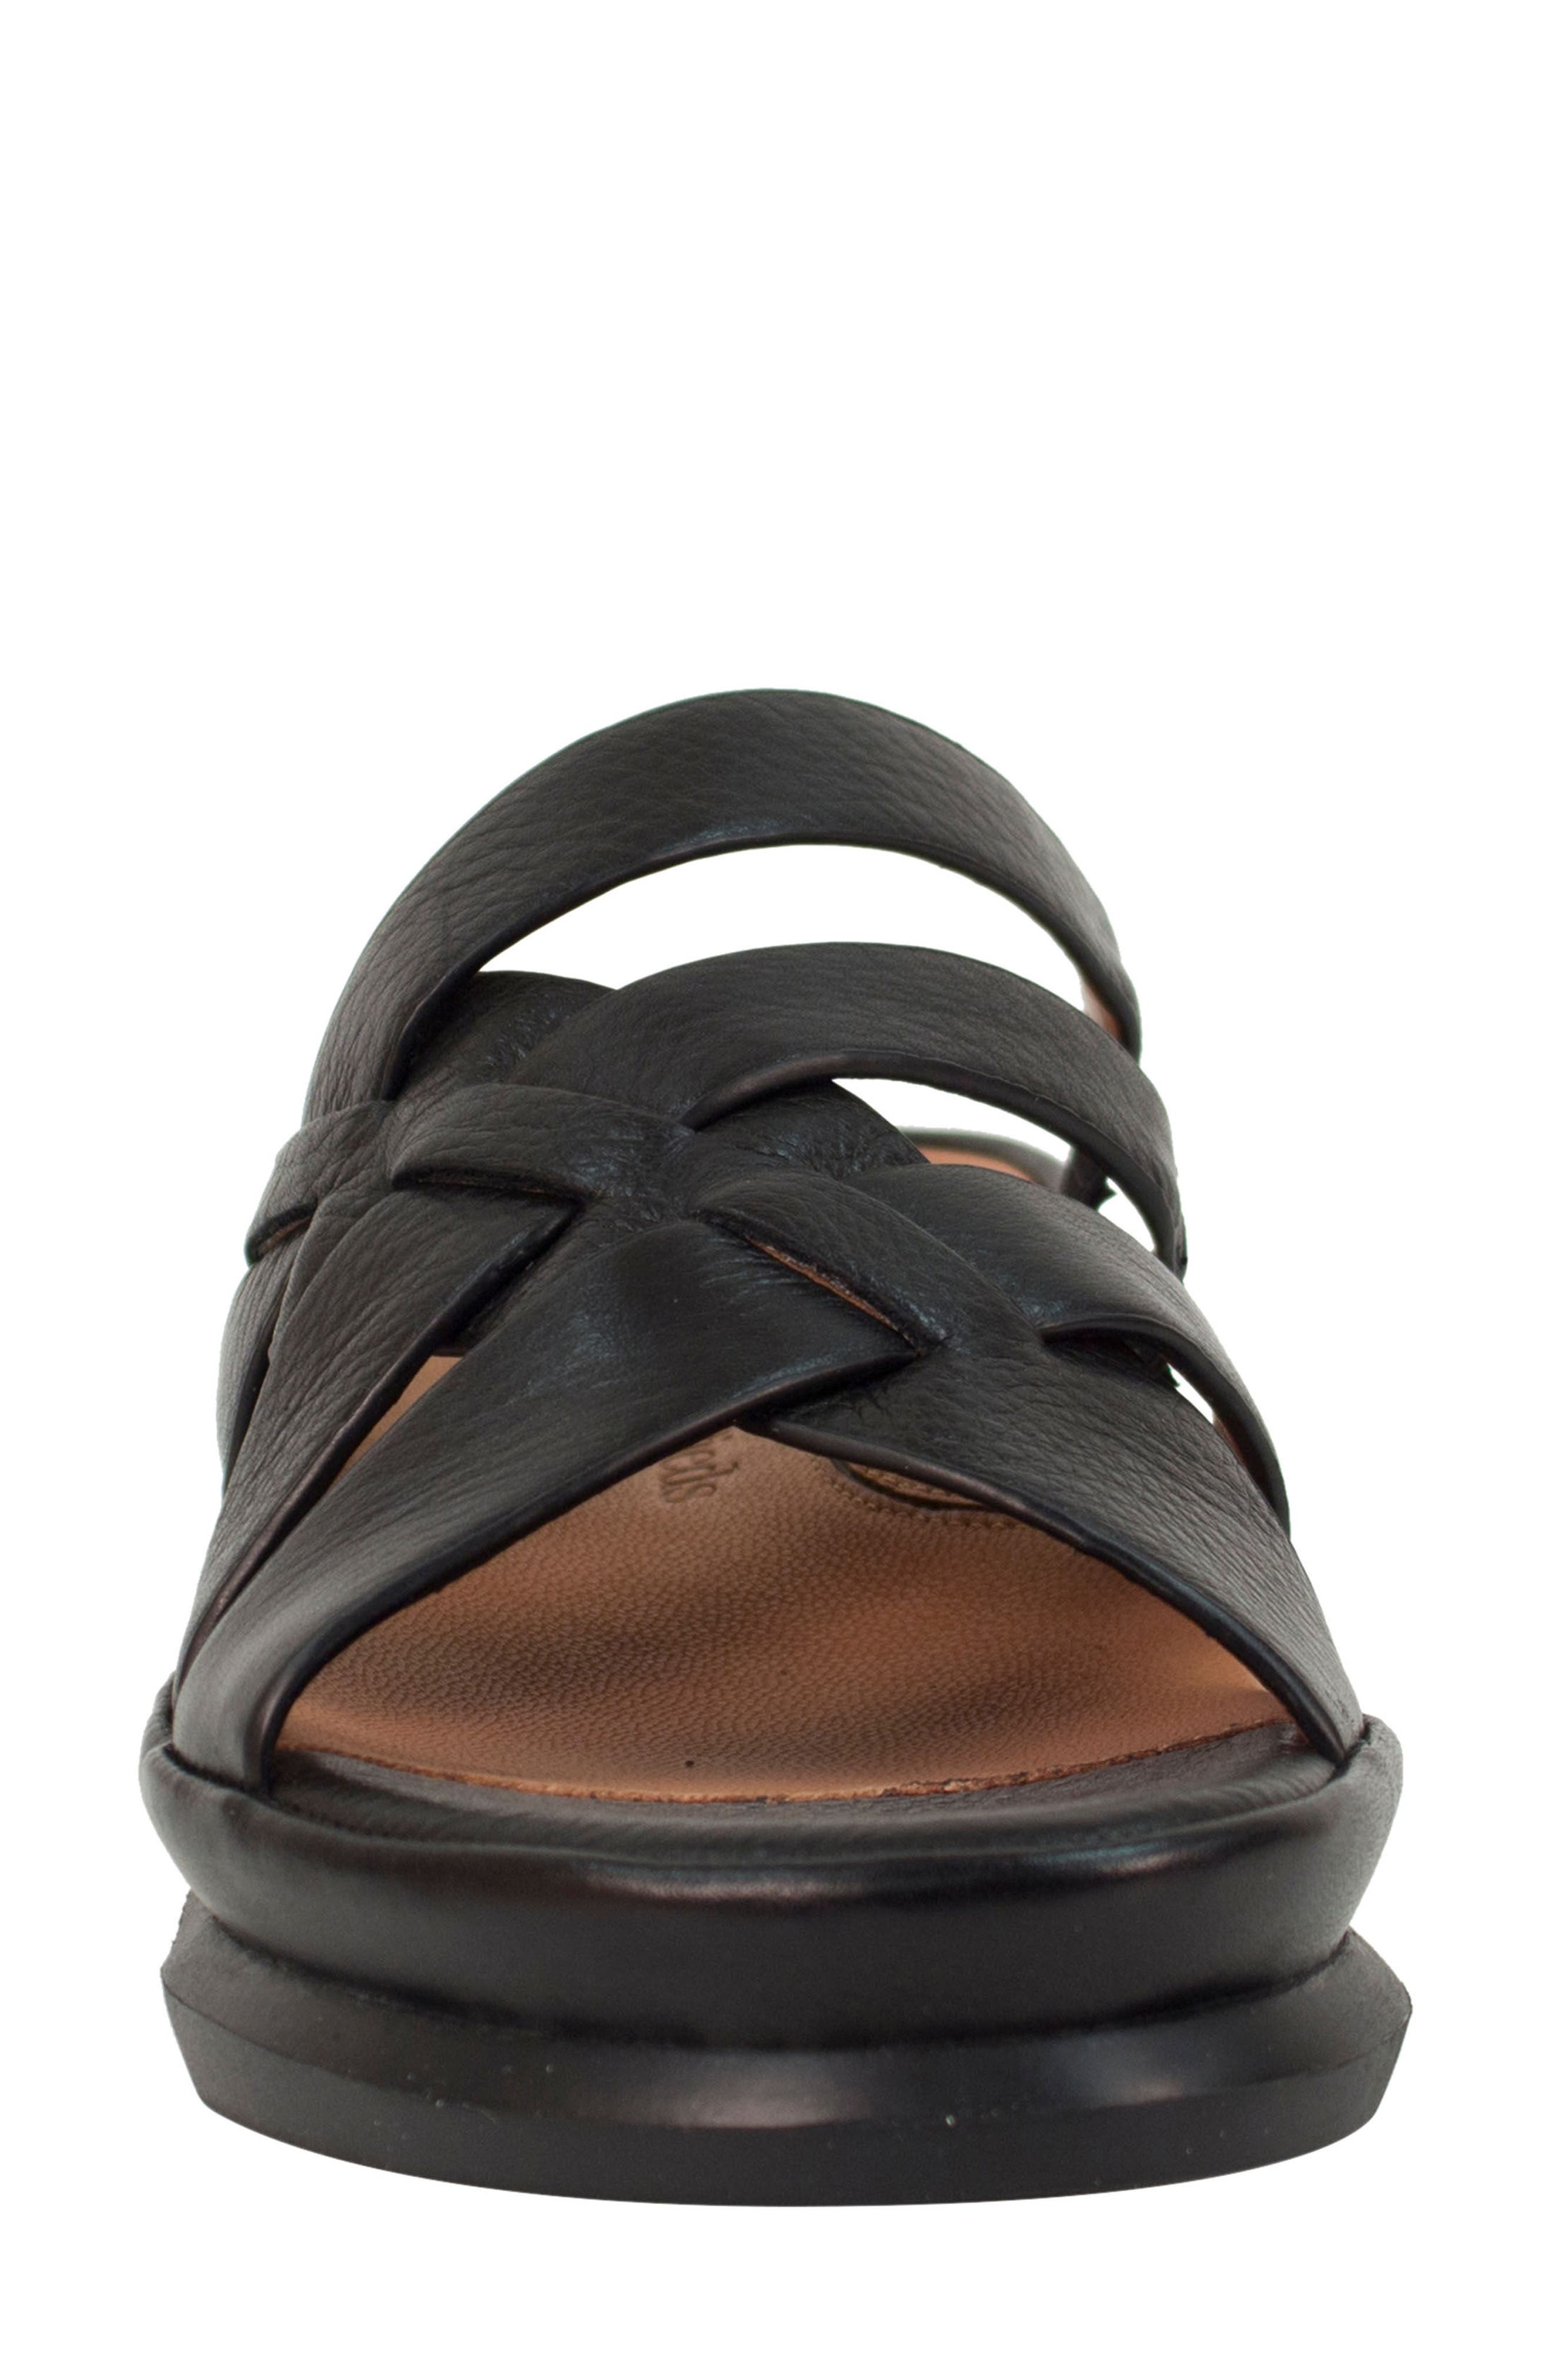 Veryl Sandal,                             Alternate thumbnail 4, color,                             Black Leather